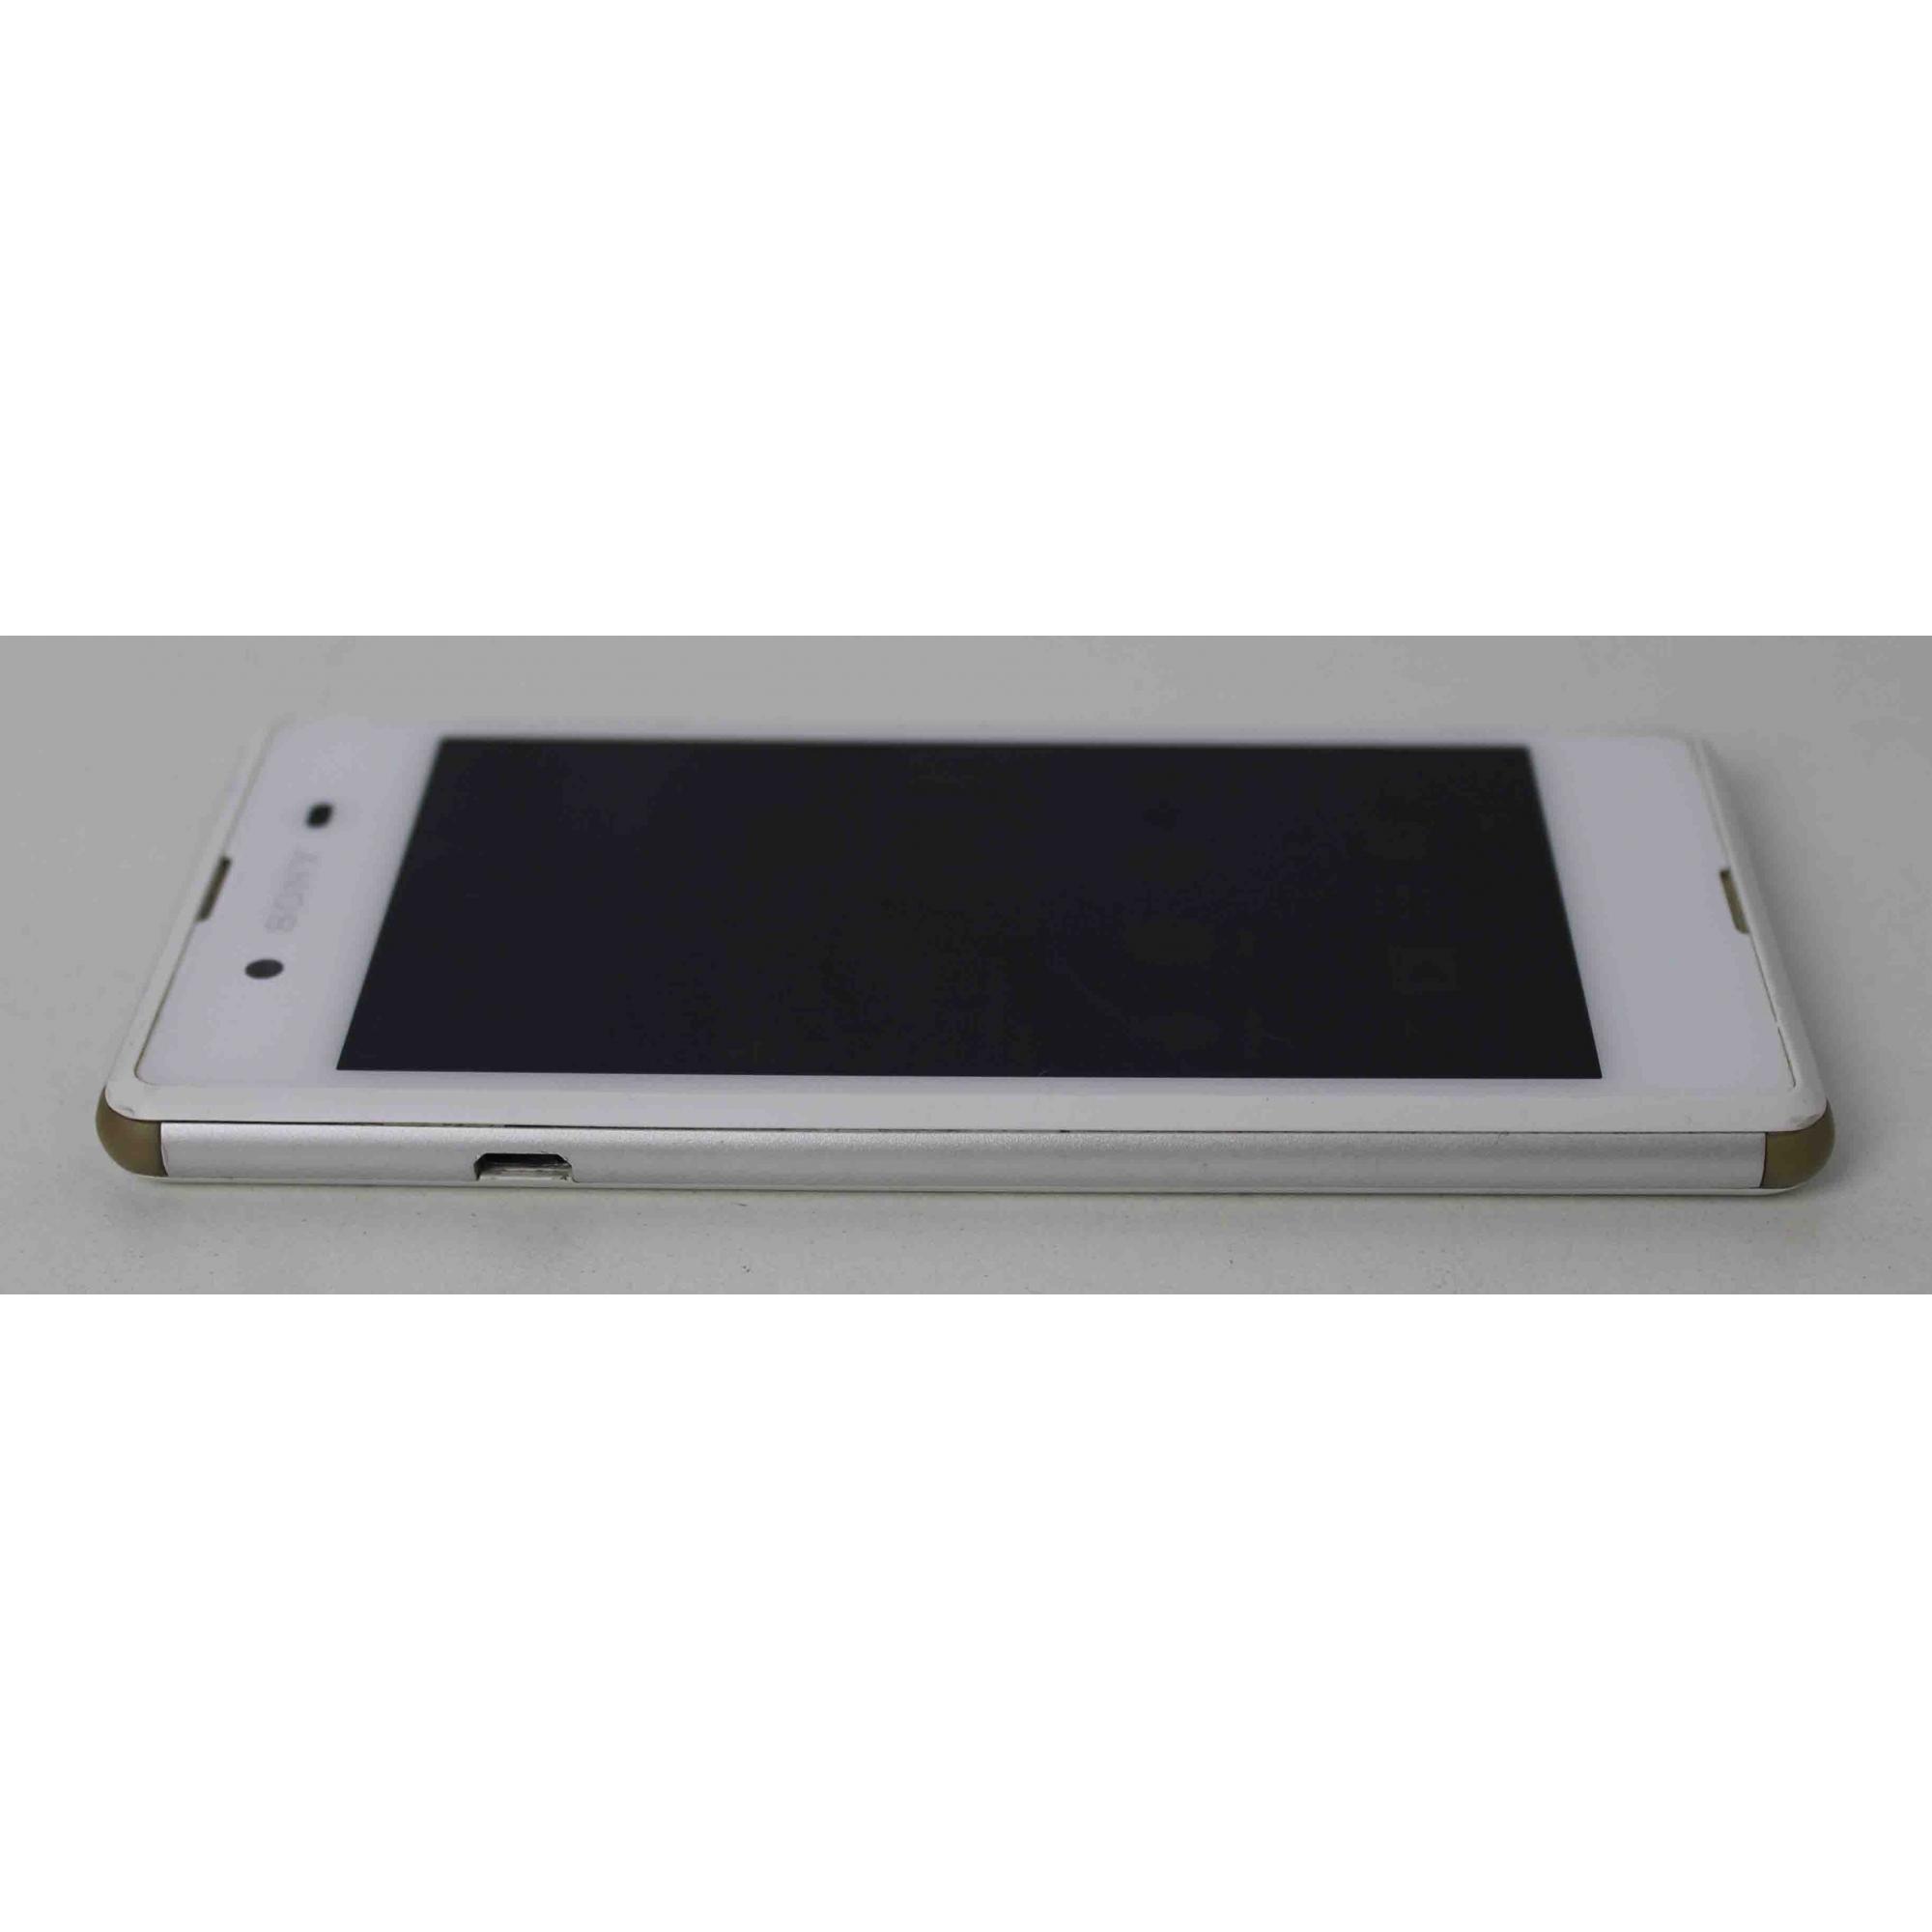 "Smartphone Sony Xperia E3 4.5"" 4GB Dual Sim 3G - Branco"